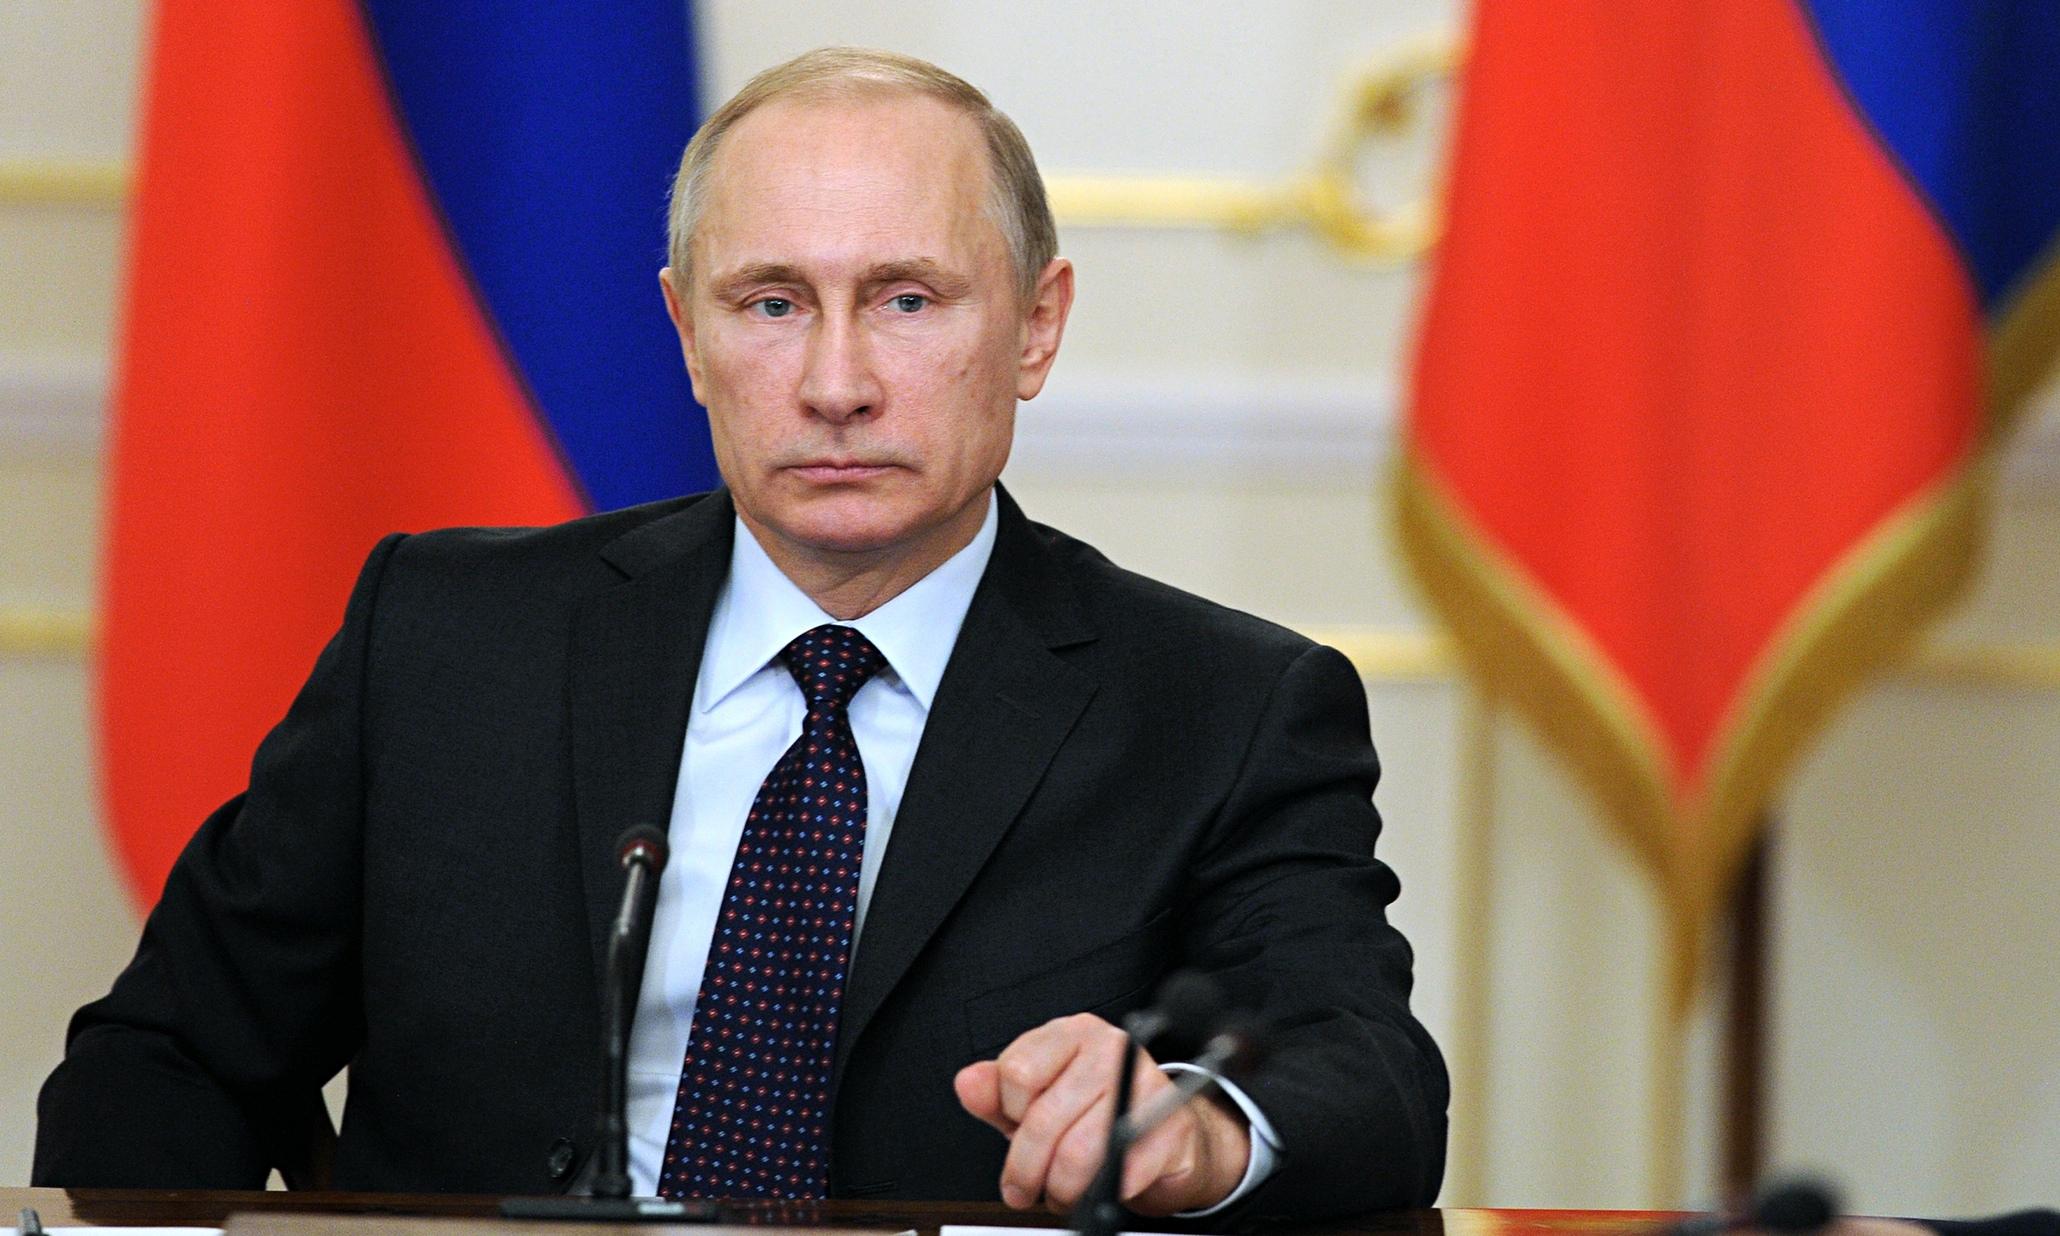 Putin may be having Turkey for Christmas